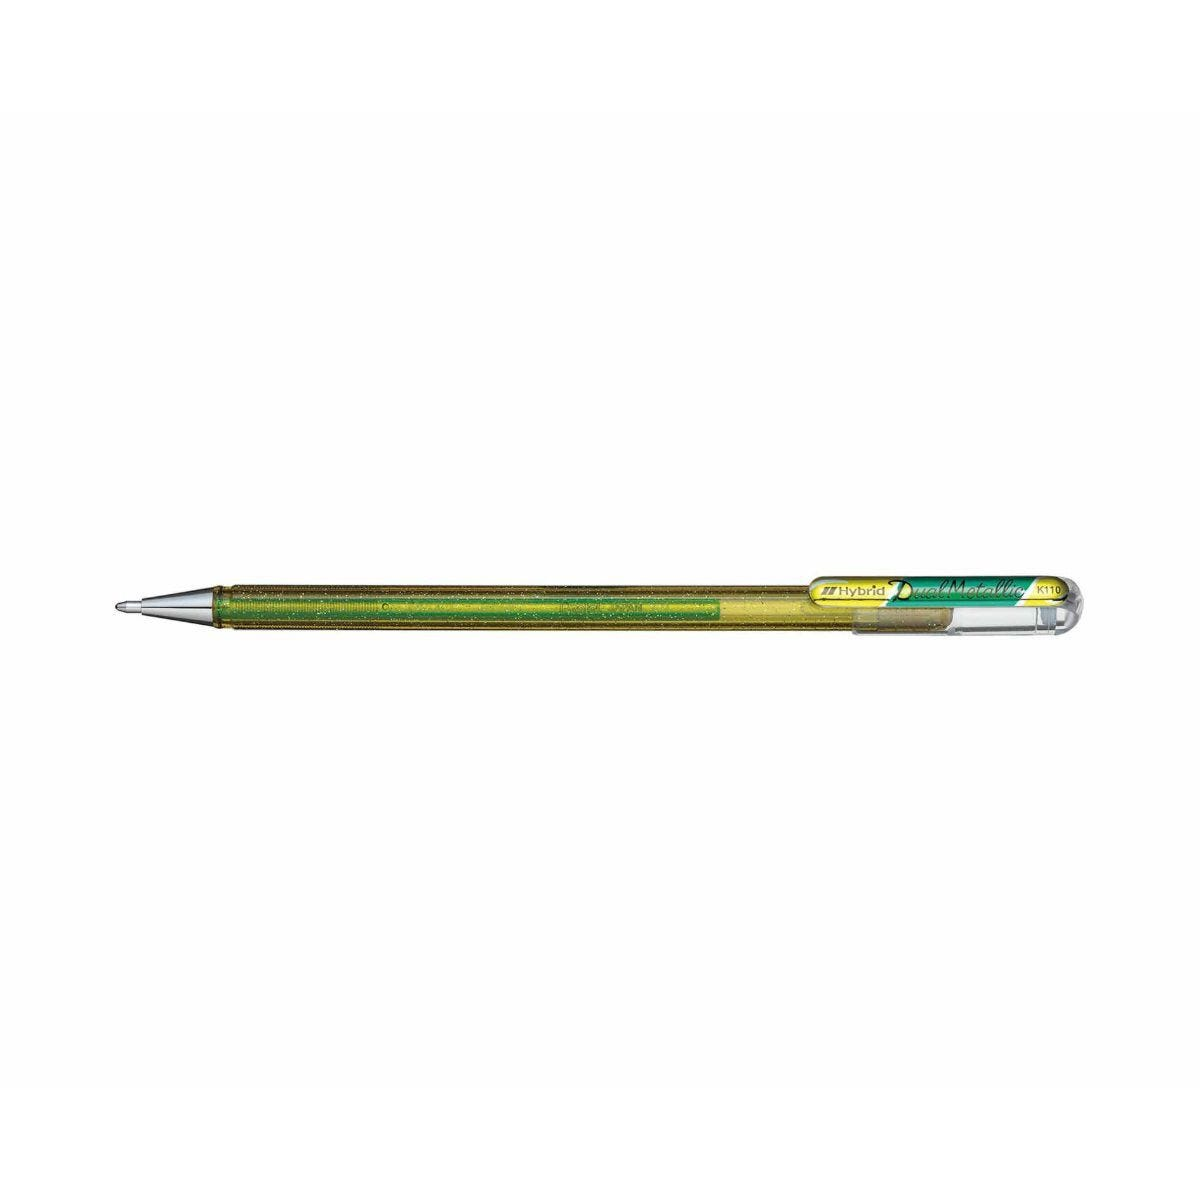 Pentel Dual Metallic Gel Pen Yellow and Metallic Green